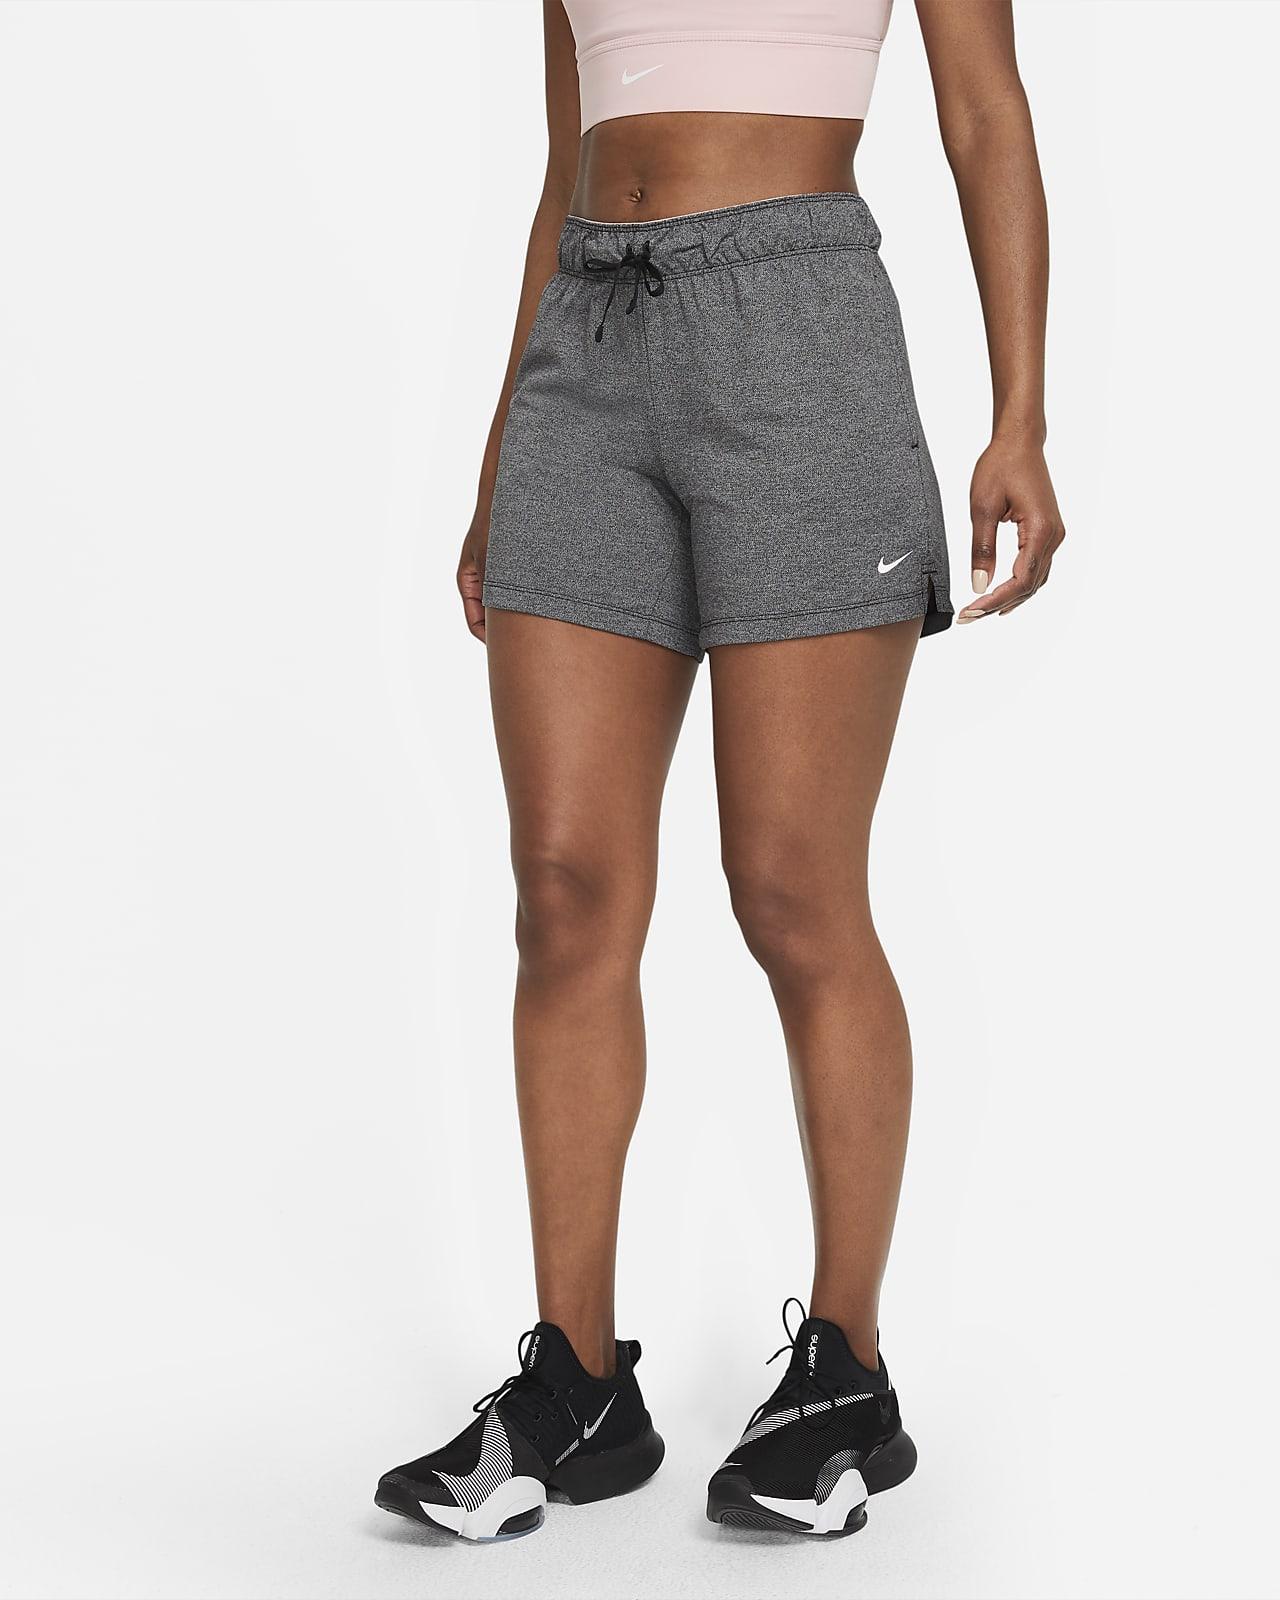 Nike Dri-FIT Attack Women's Training Shorts